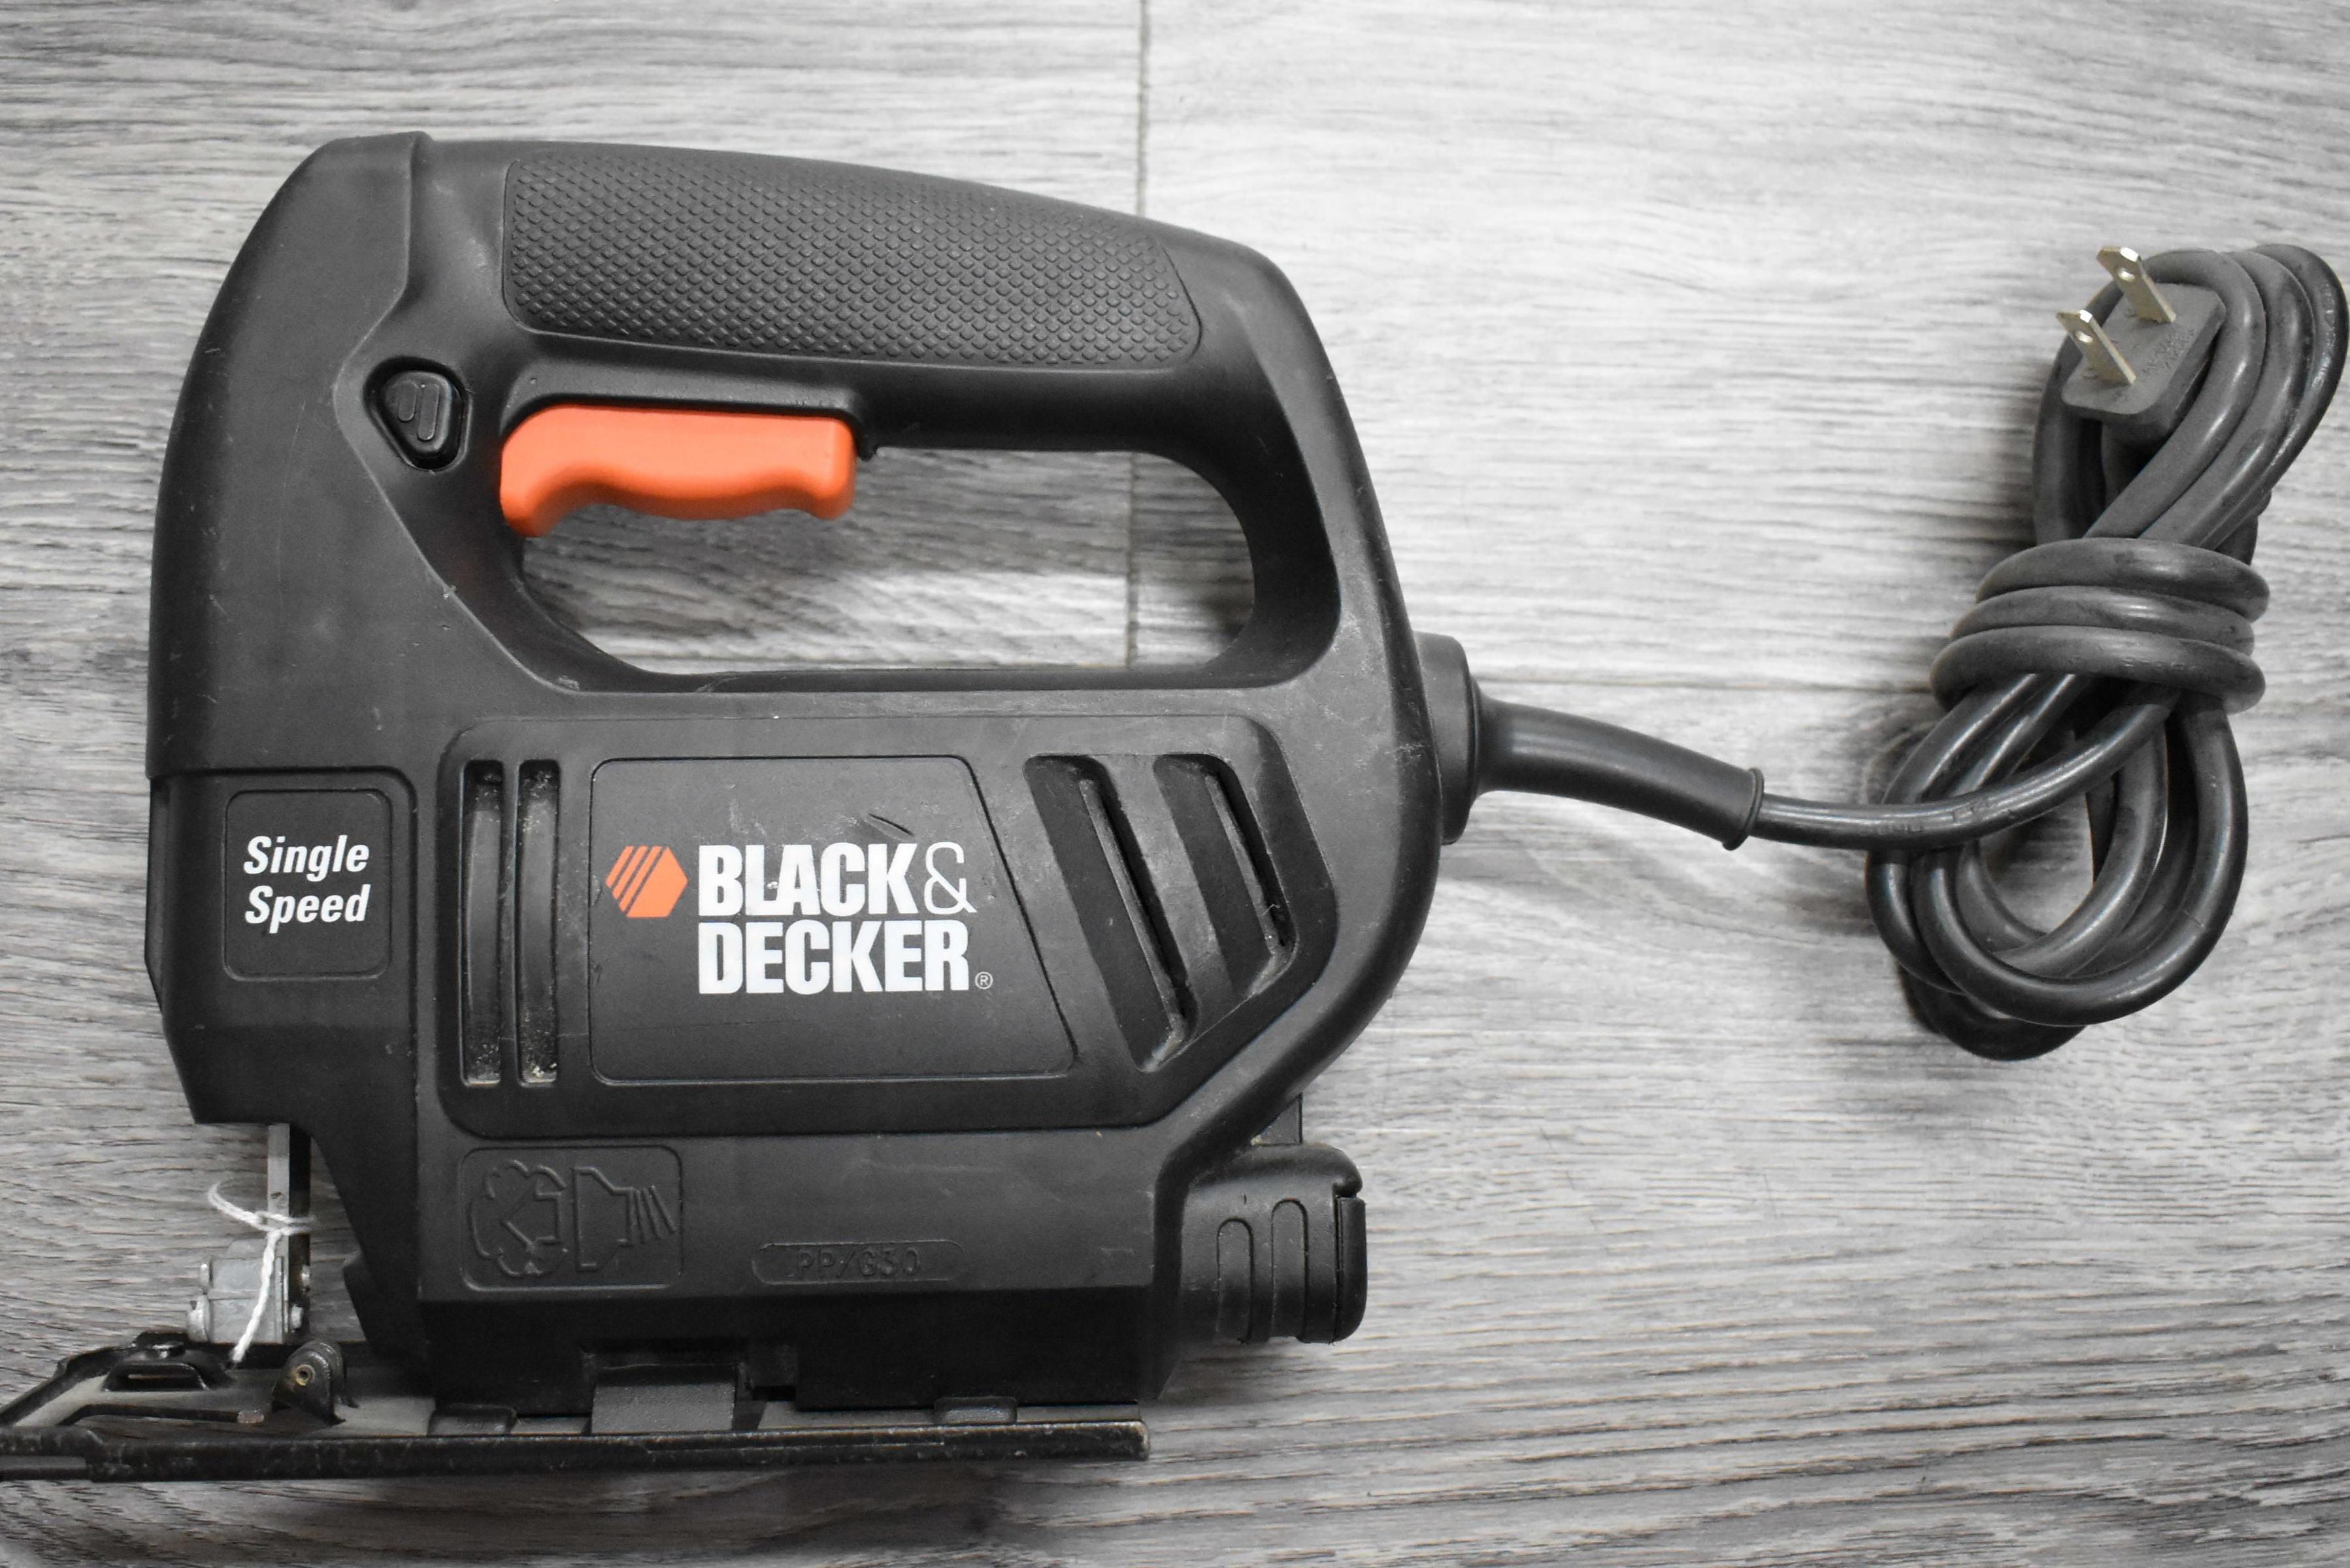 BLACK & DECKER - 7552 - JIG SAW TOOLS-POWER